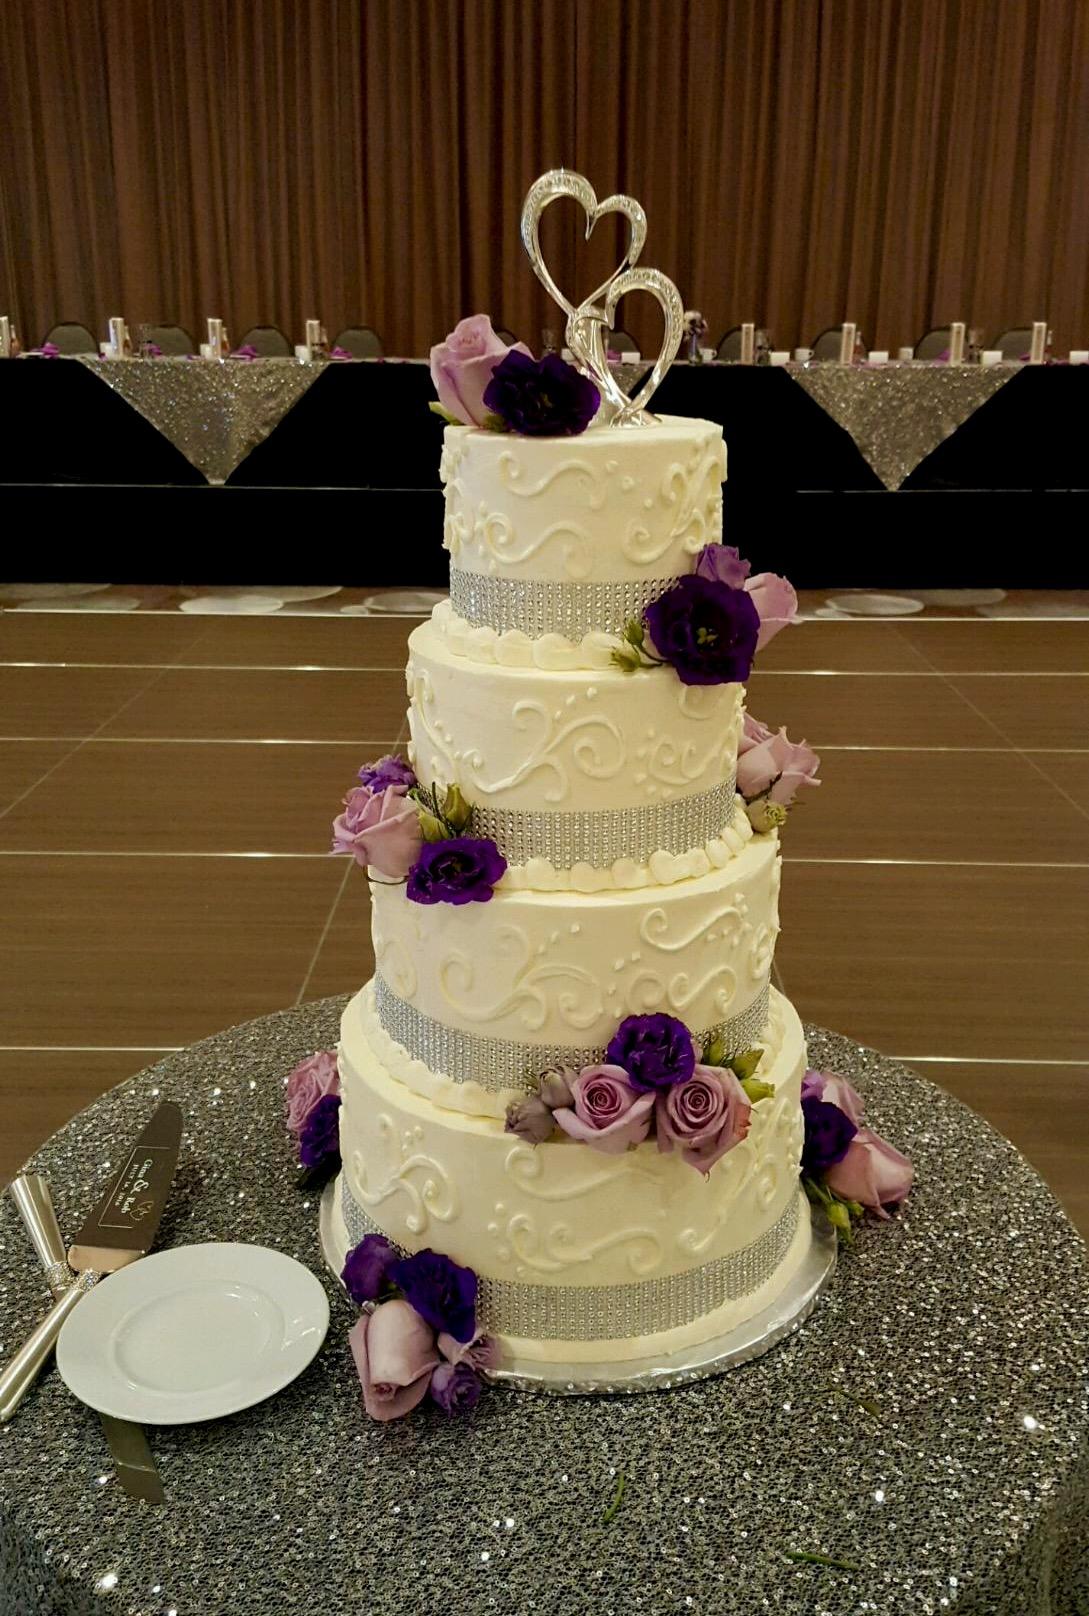 Wedding4tierwhitepurpleflowers.jpg